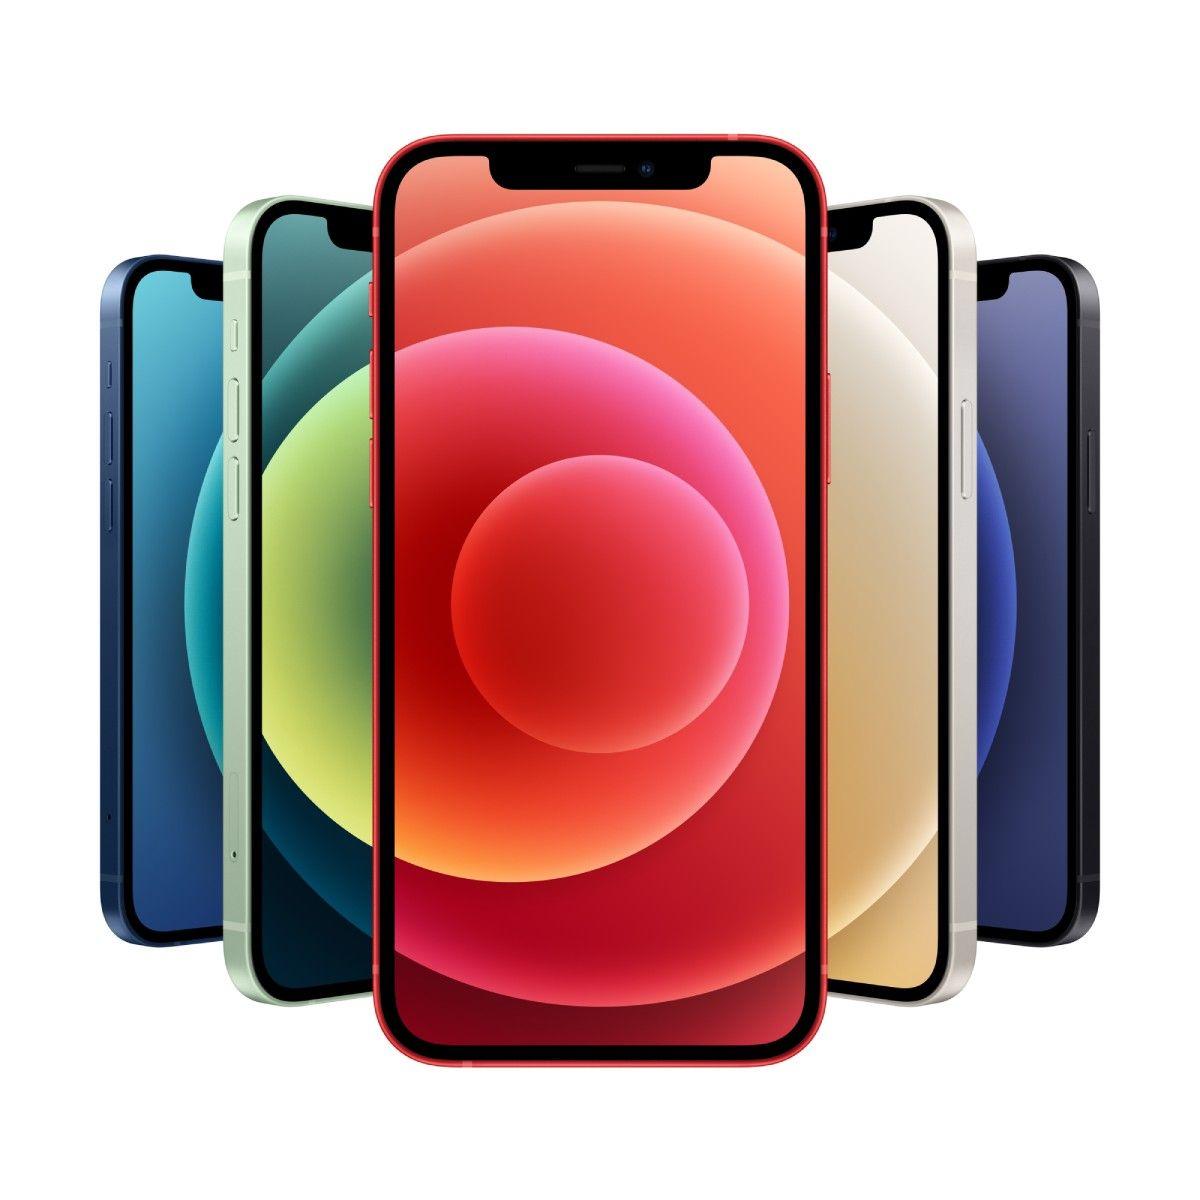 buy iPhone 12 online in india best prices